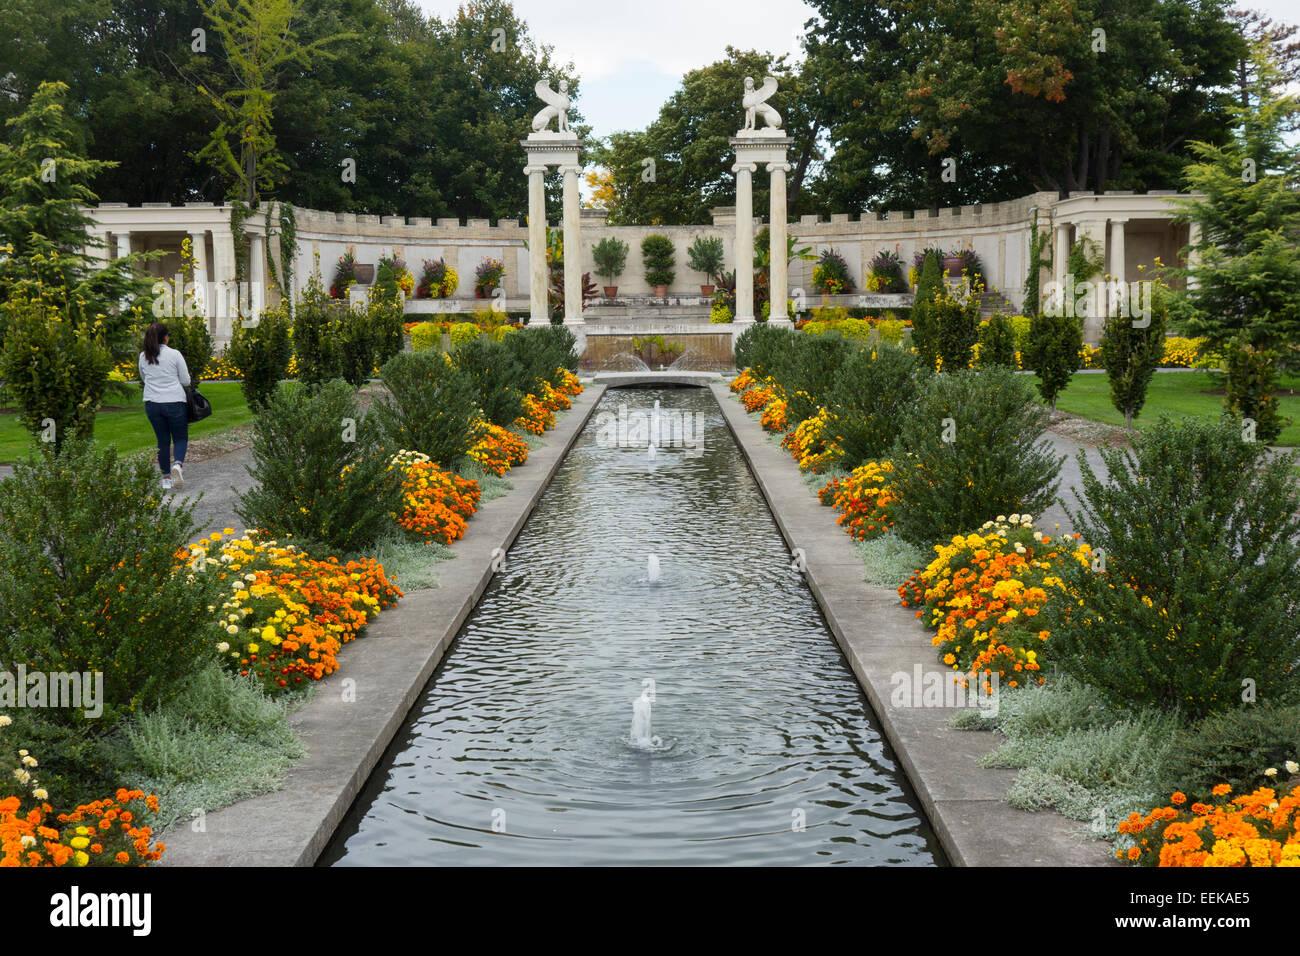 Untermyer Gardens Conservancy In Yonkers Ny Stock Photo 77871981